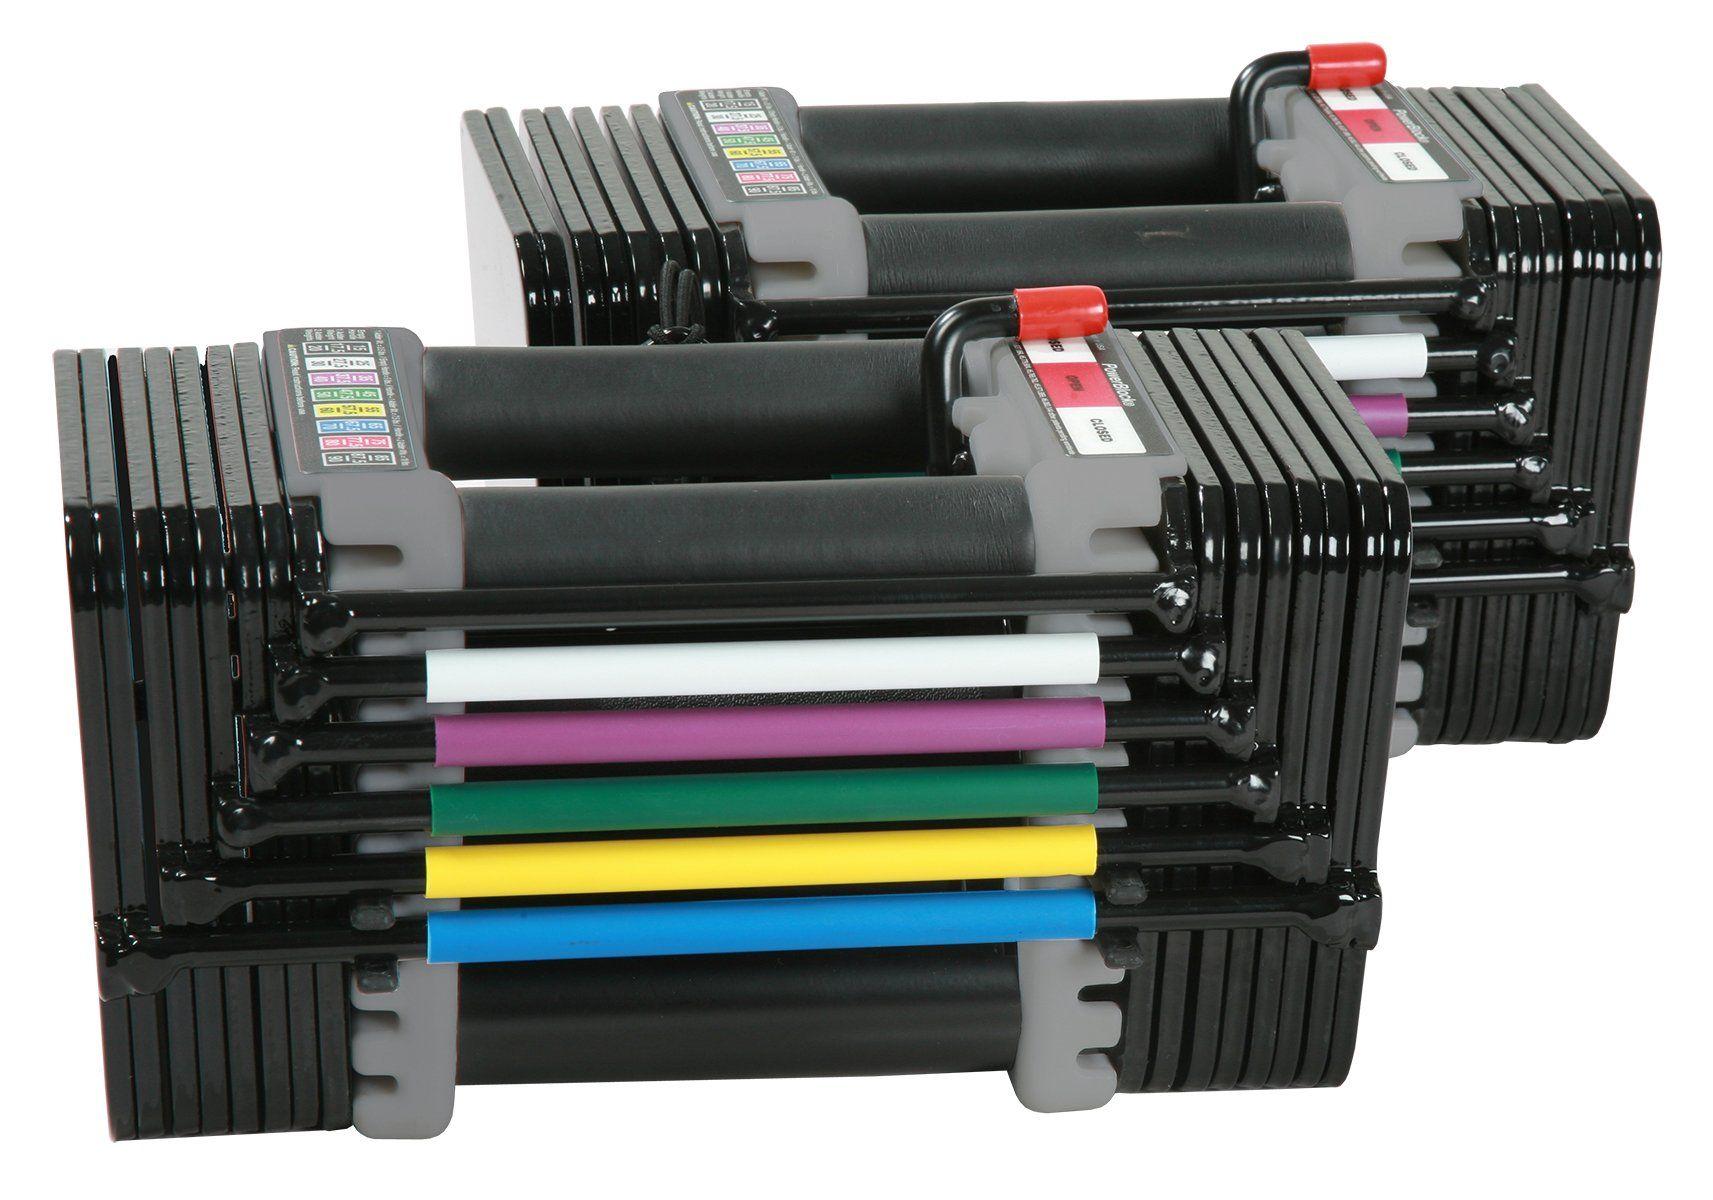 PowerBlock 50 Plus Dumbbell Set, Black